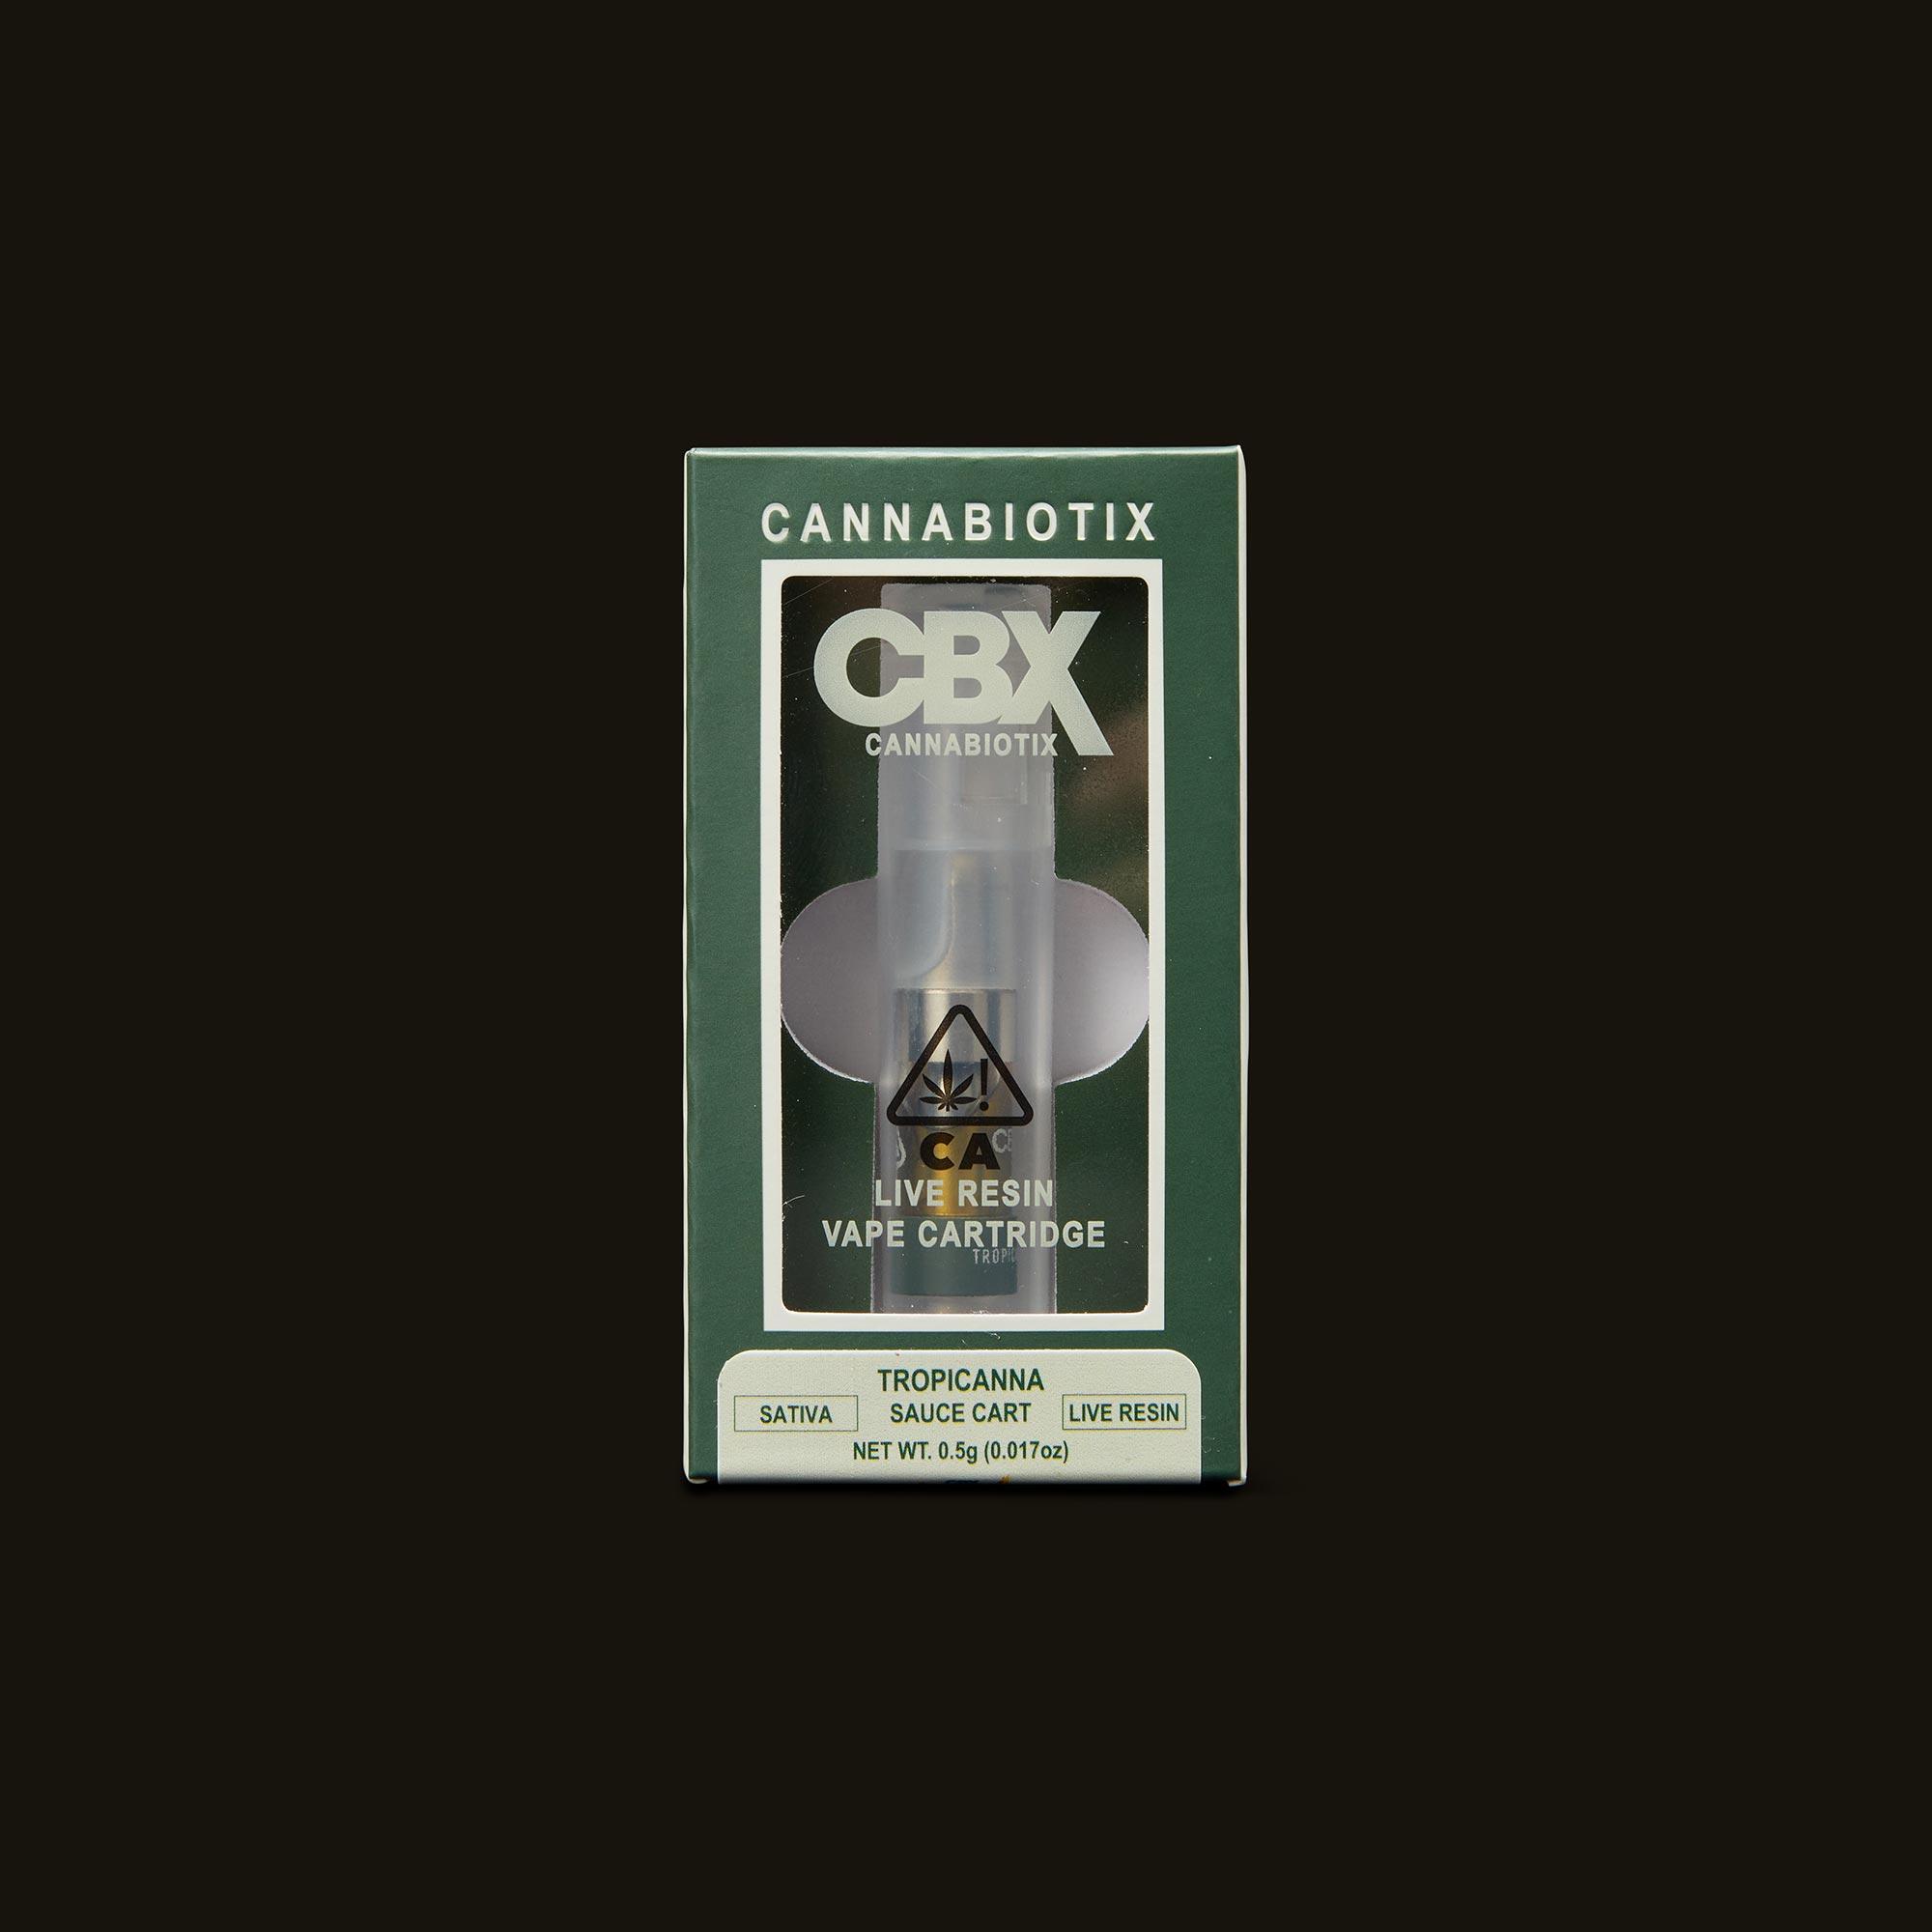 Cannabiotix (CBX) Tropicanna Live Resin Cartridge Front Packaging